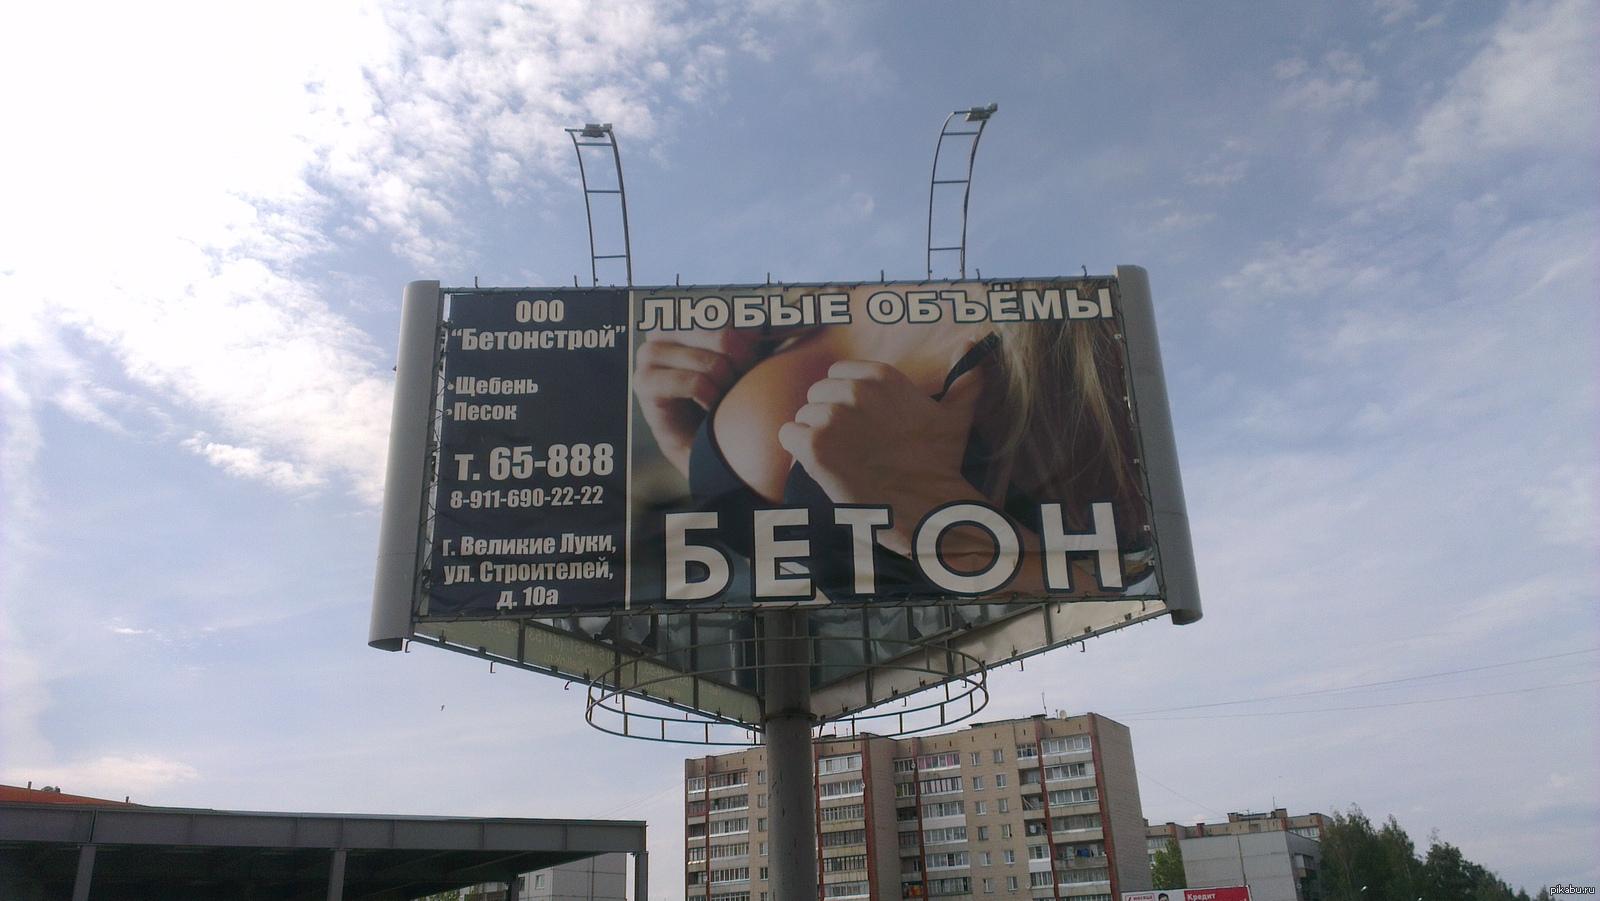 Реклама бетона бетон ботаково